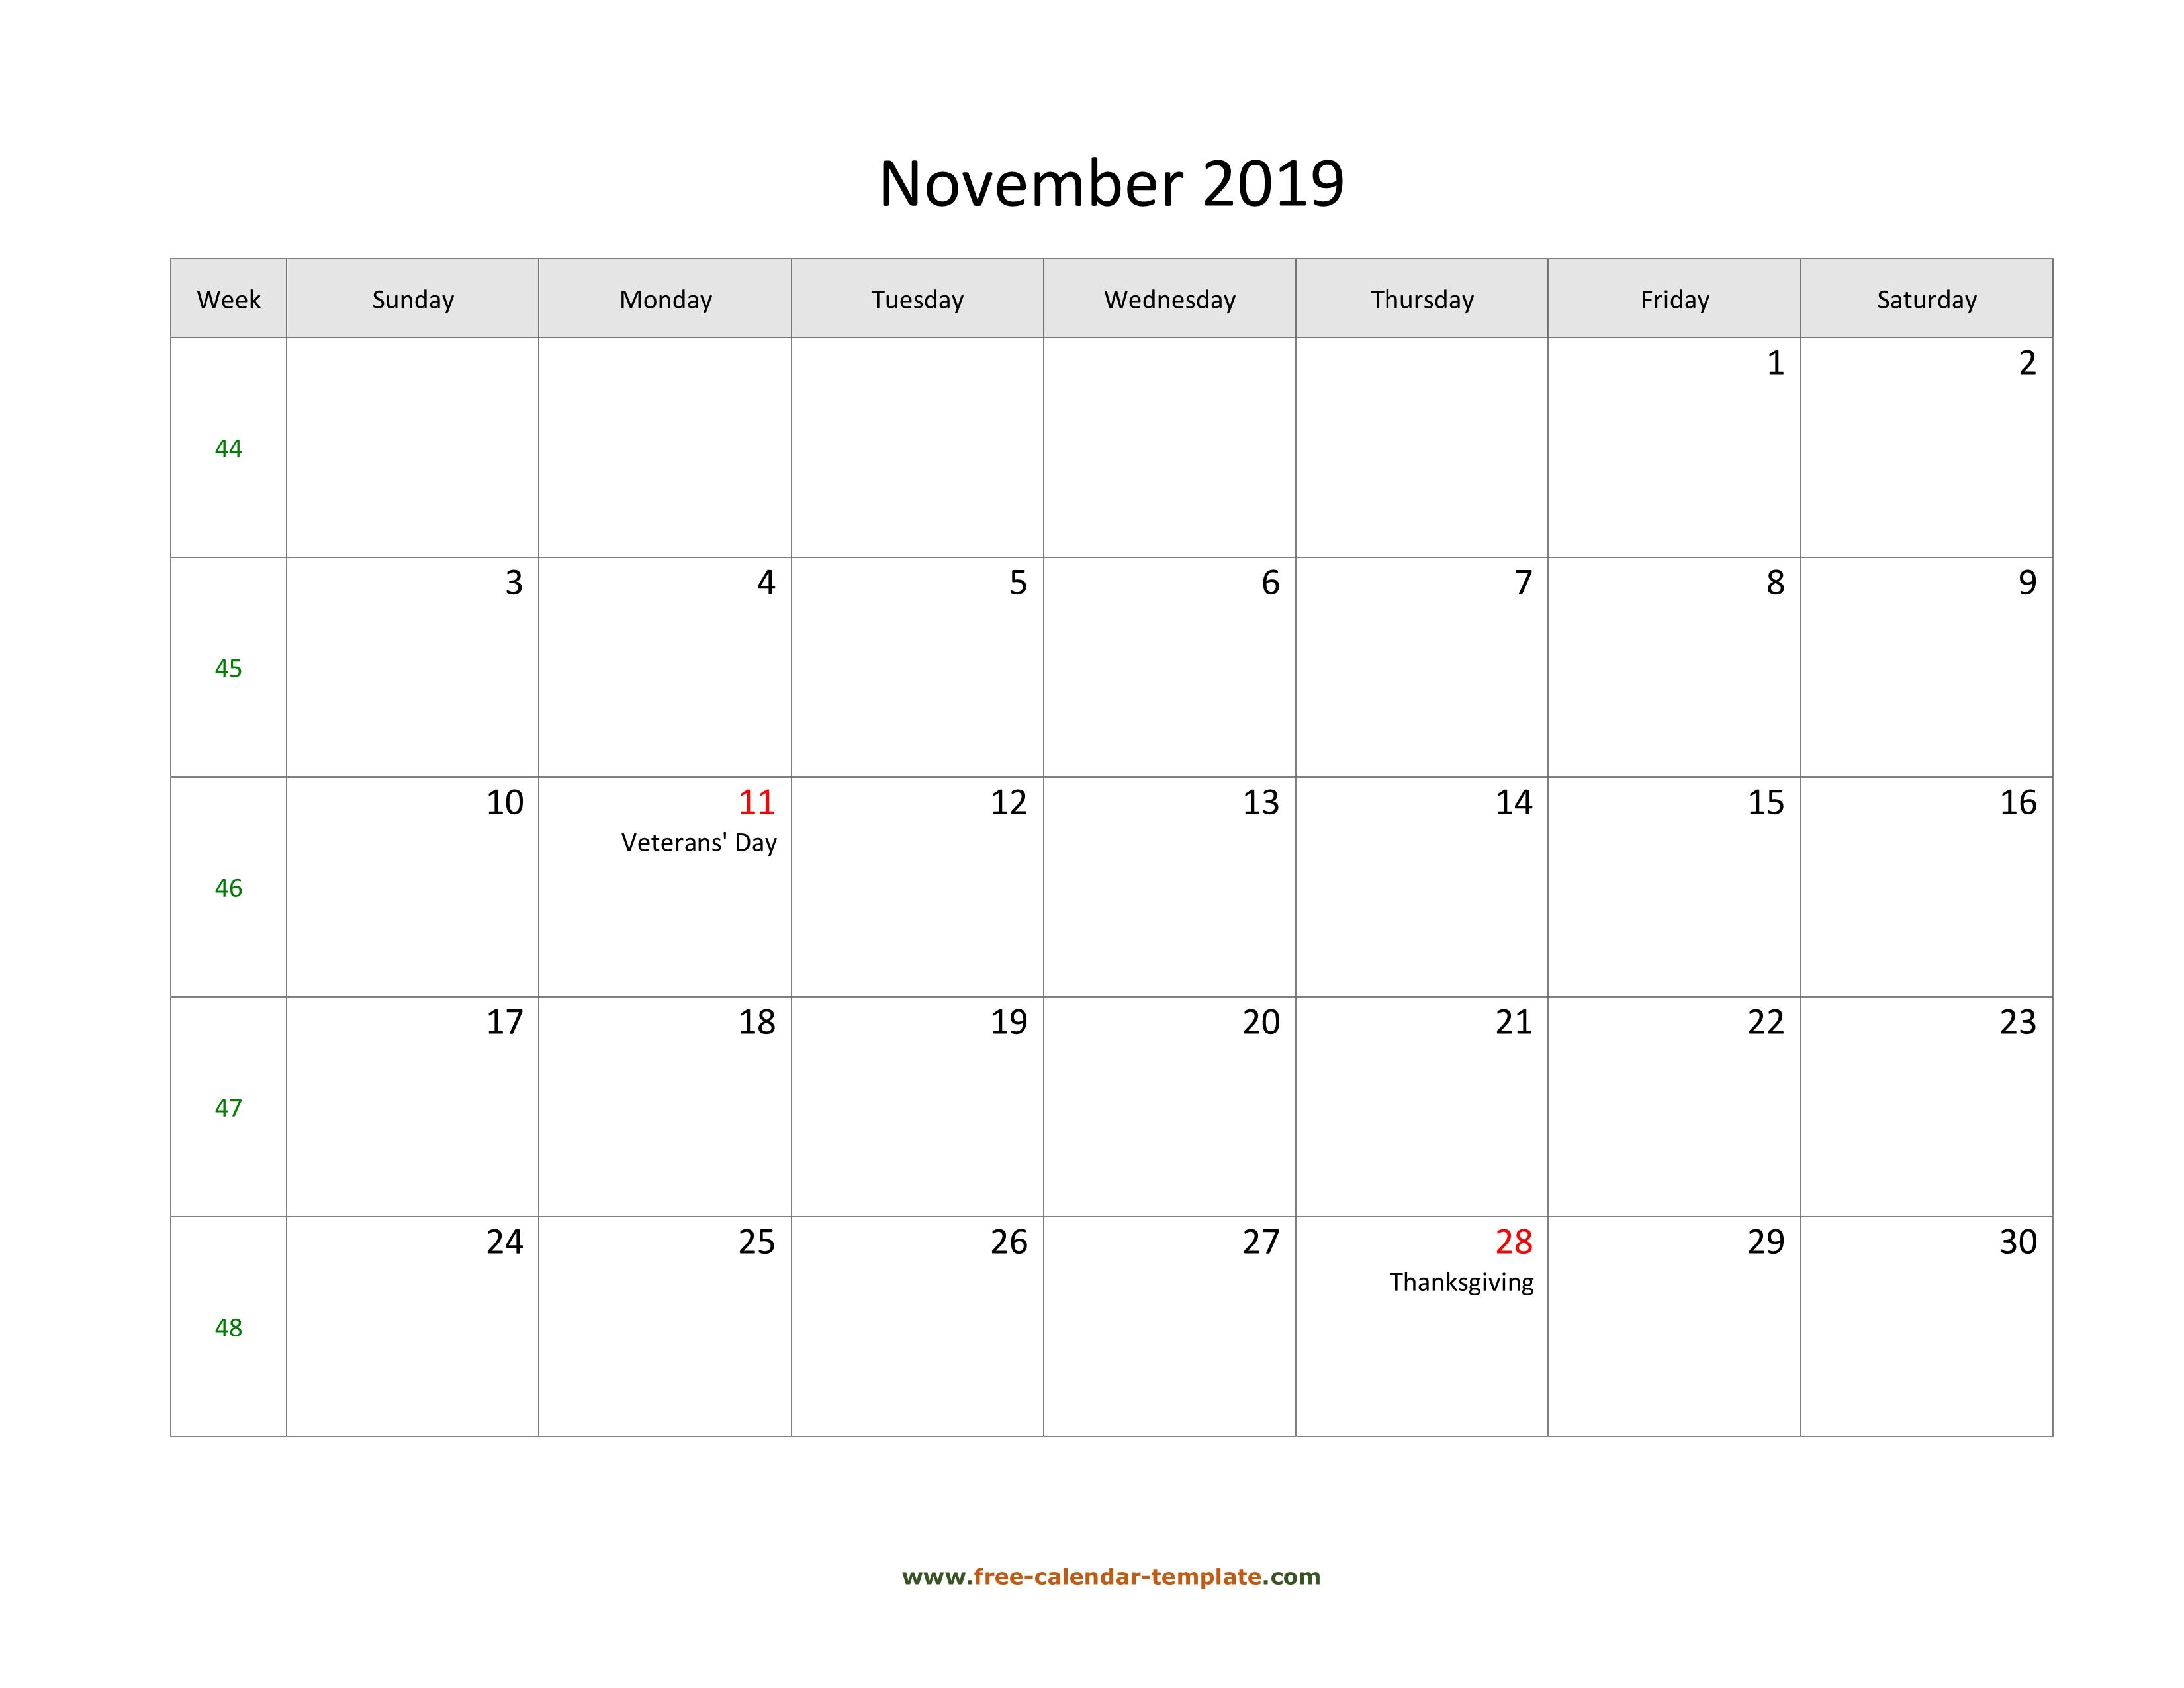 Free 2019 Calendar Blank November Template Horizontal